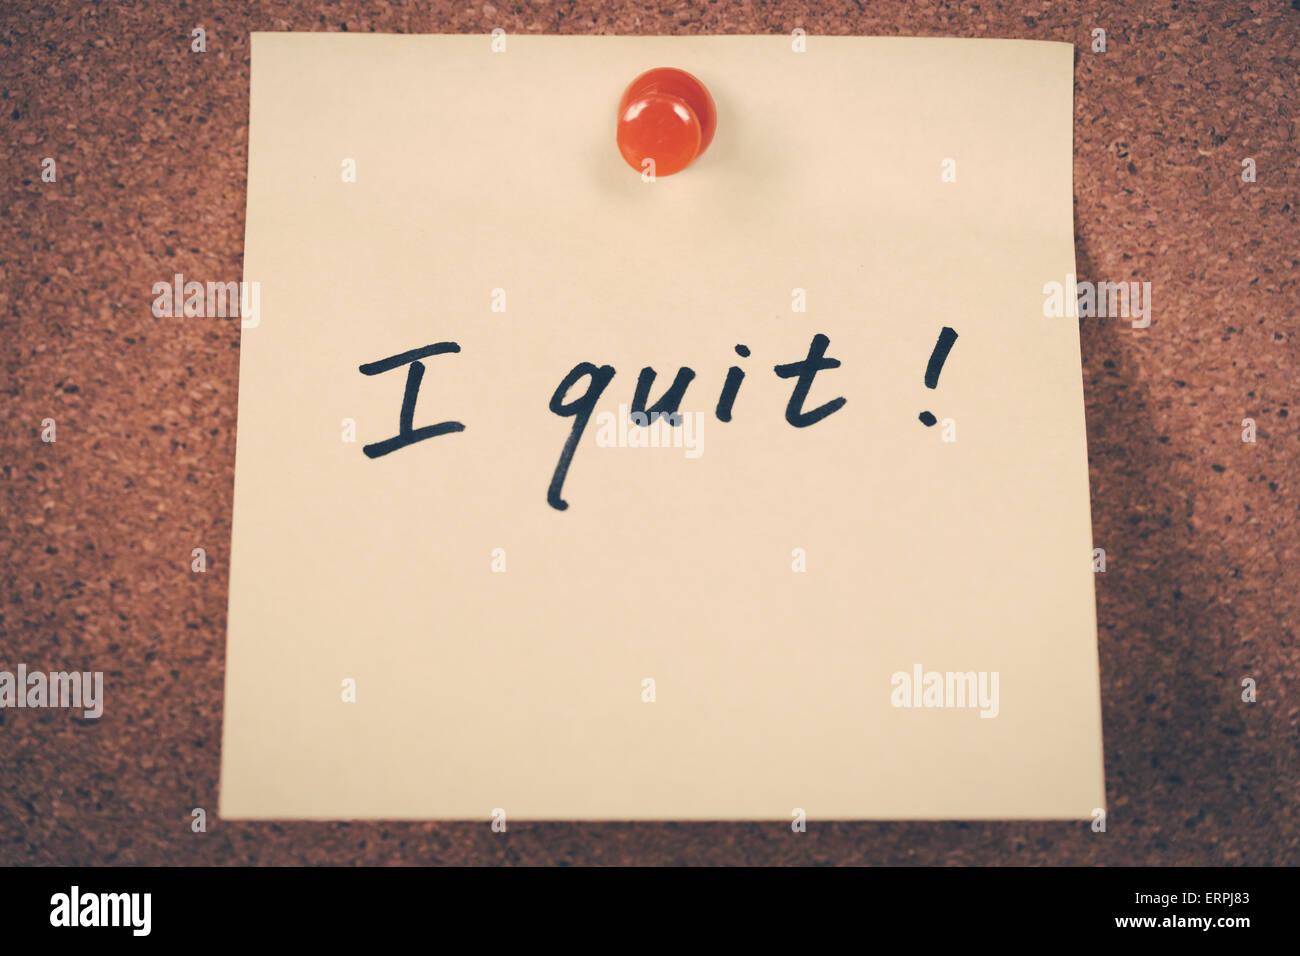 I quit - Stock Image